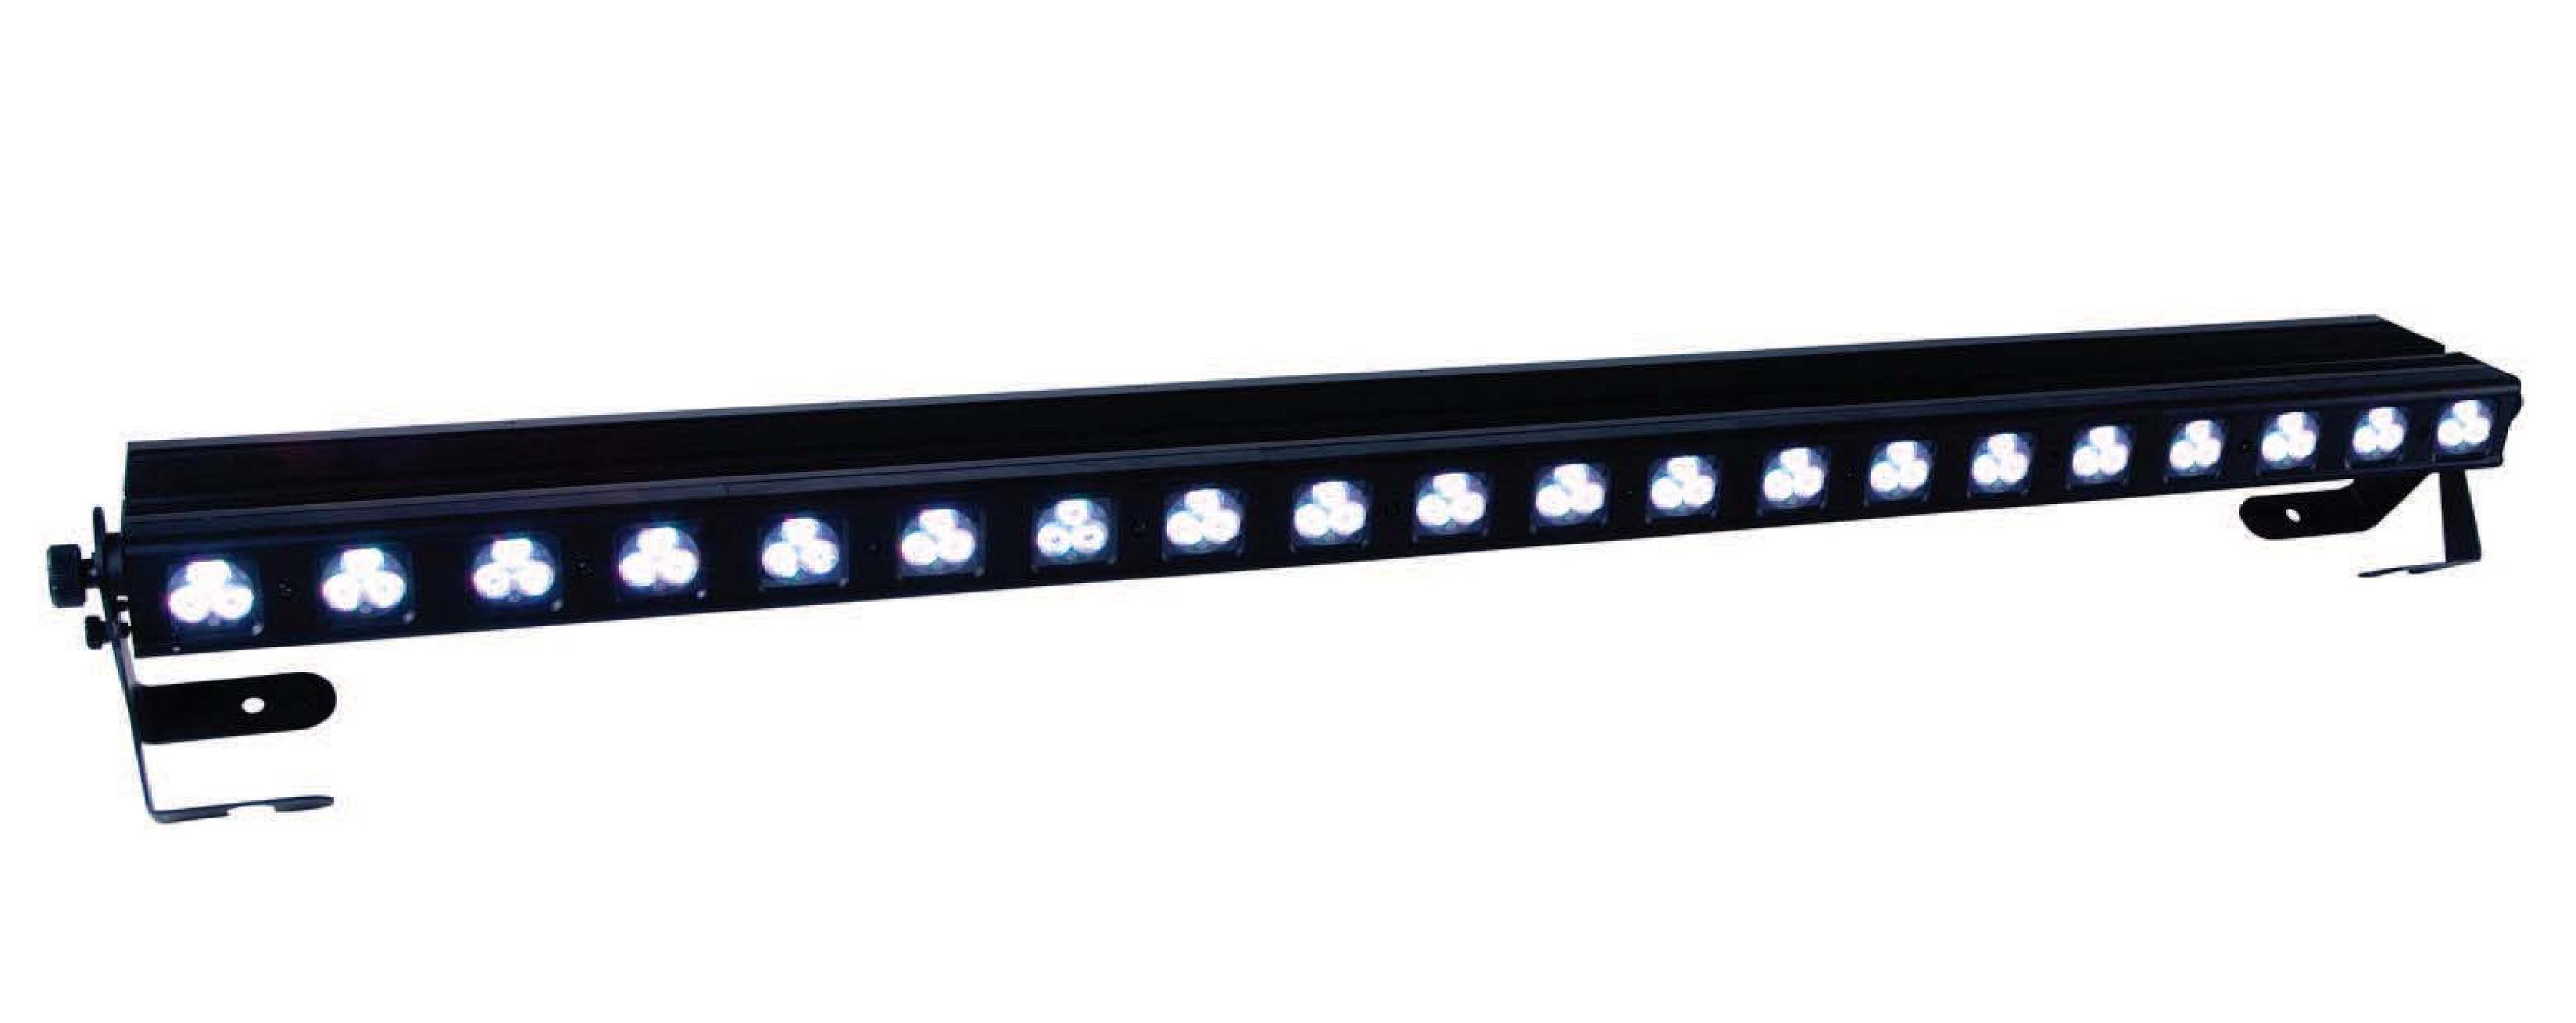 Elation Lighting DRCDT60S 8 Pack Design LED Strip 60 Strip Effect Fixtures New